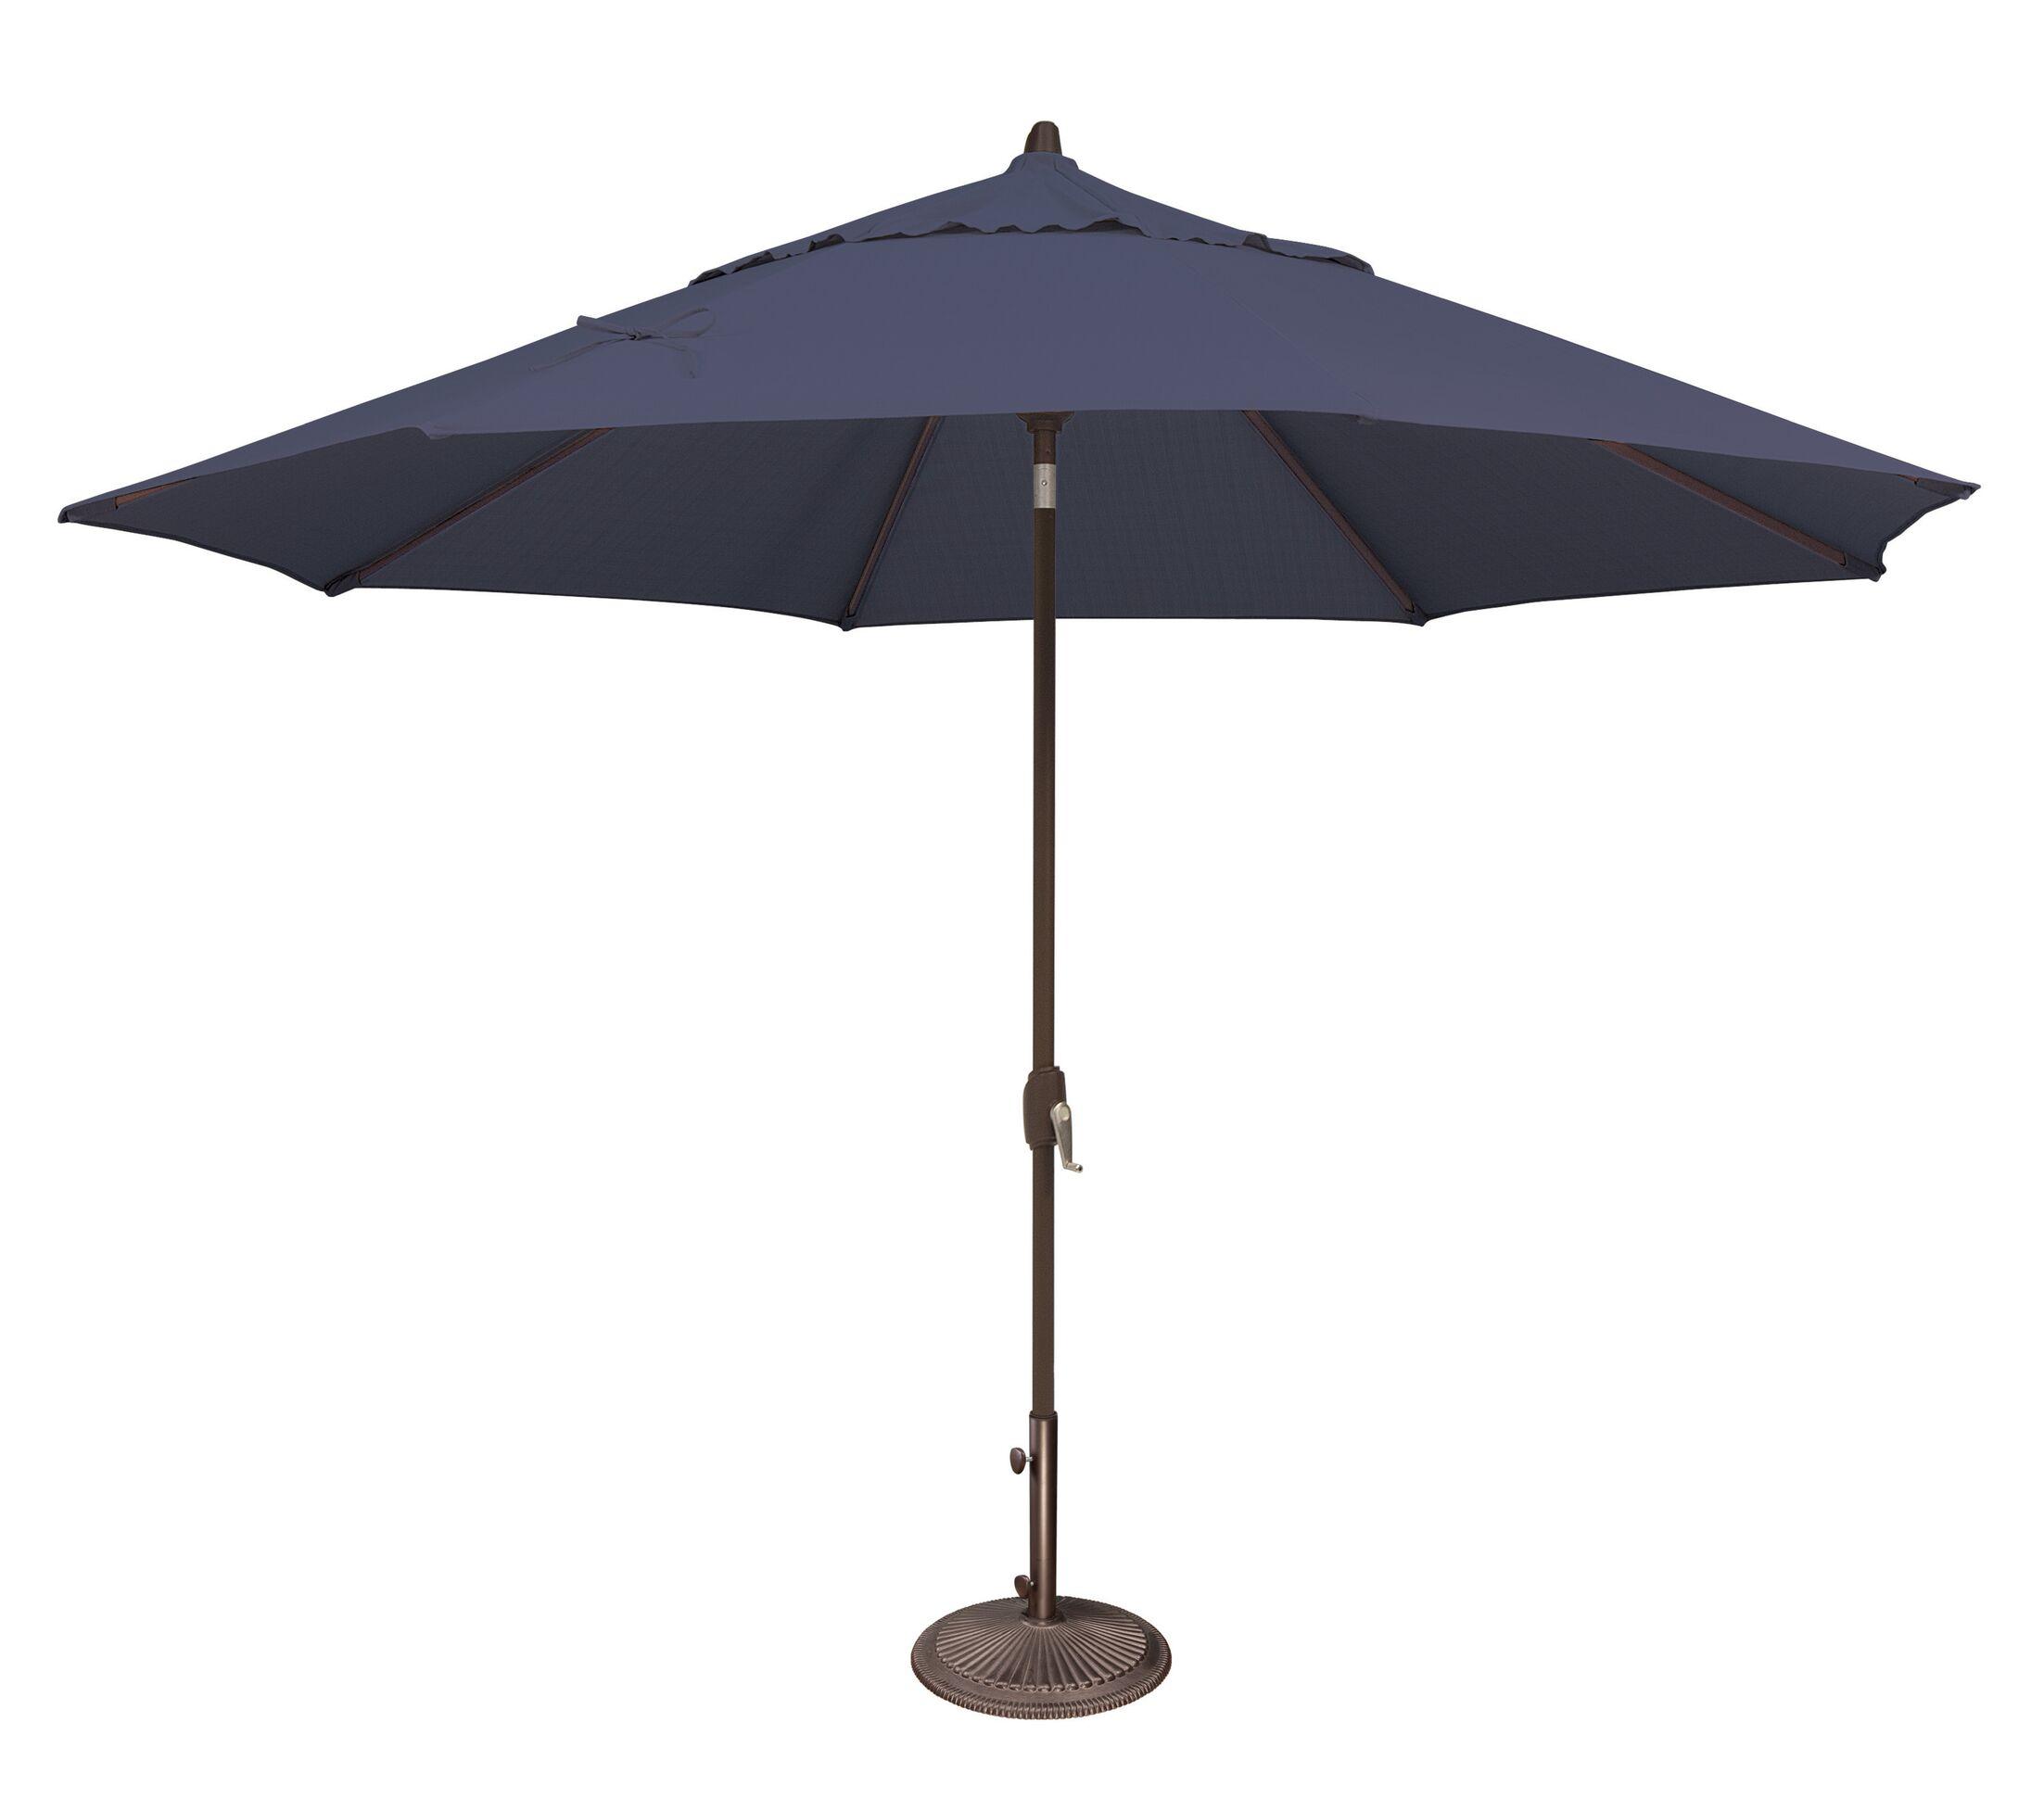 Lanai 11' Market Umbrella Fabric: Sunbrella / Navy